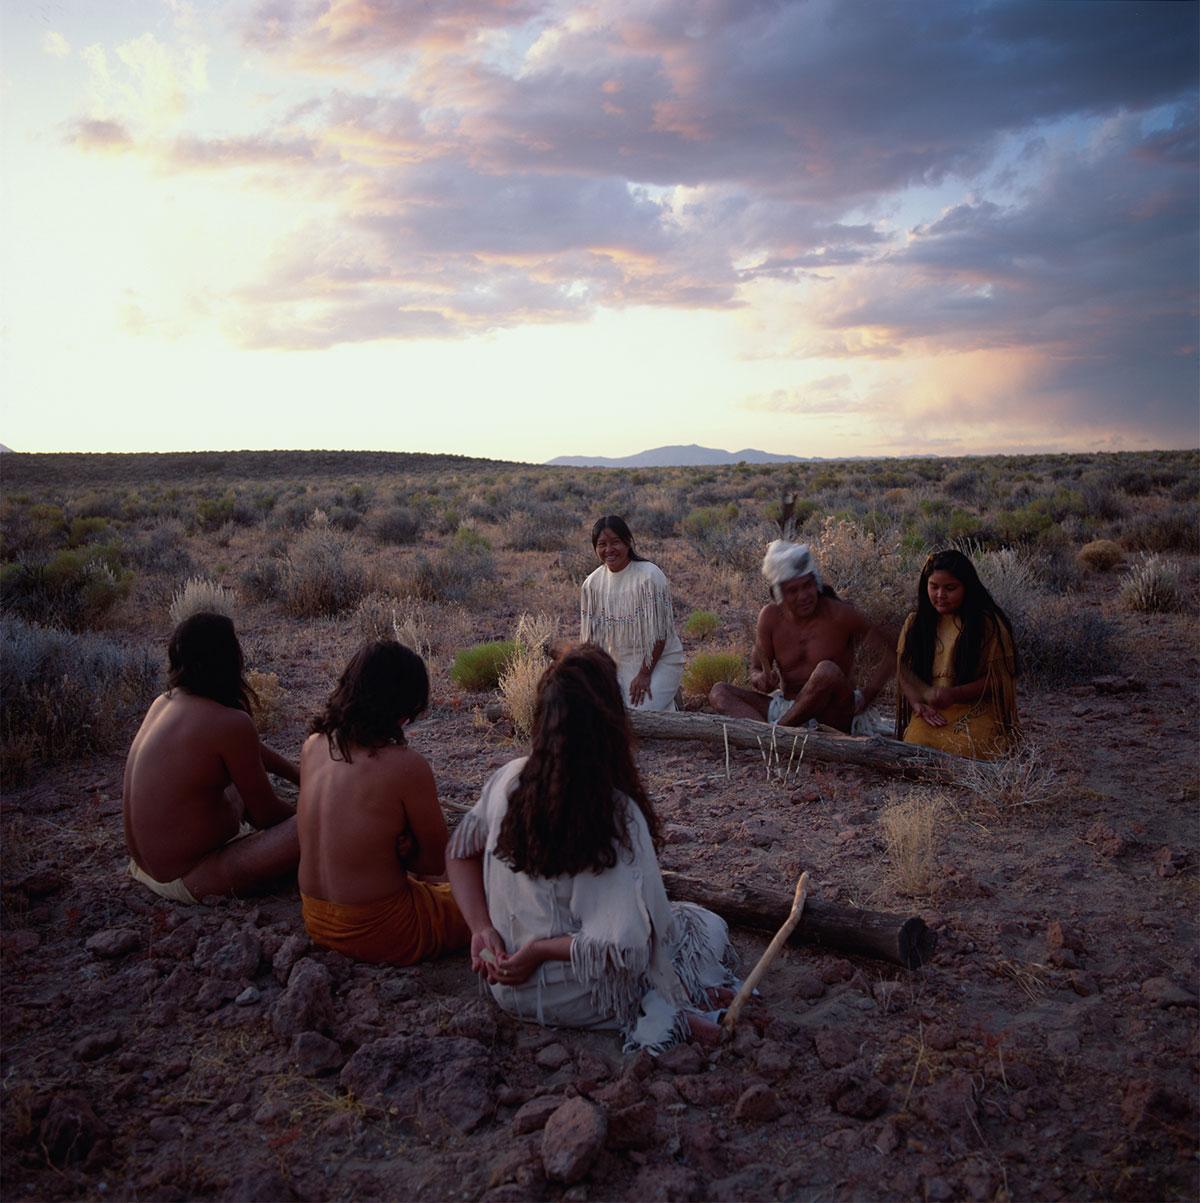 Native Americans - Paiute - Shoshone - Handgame